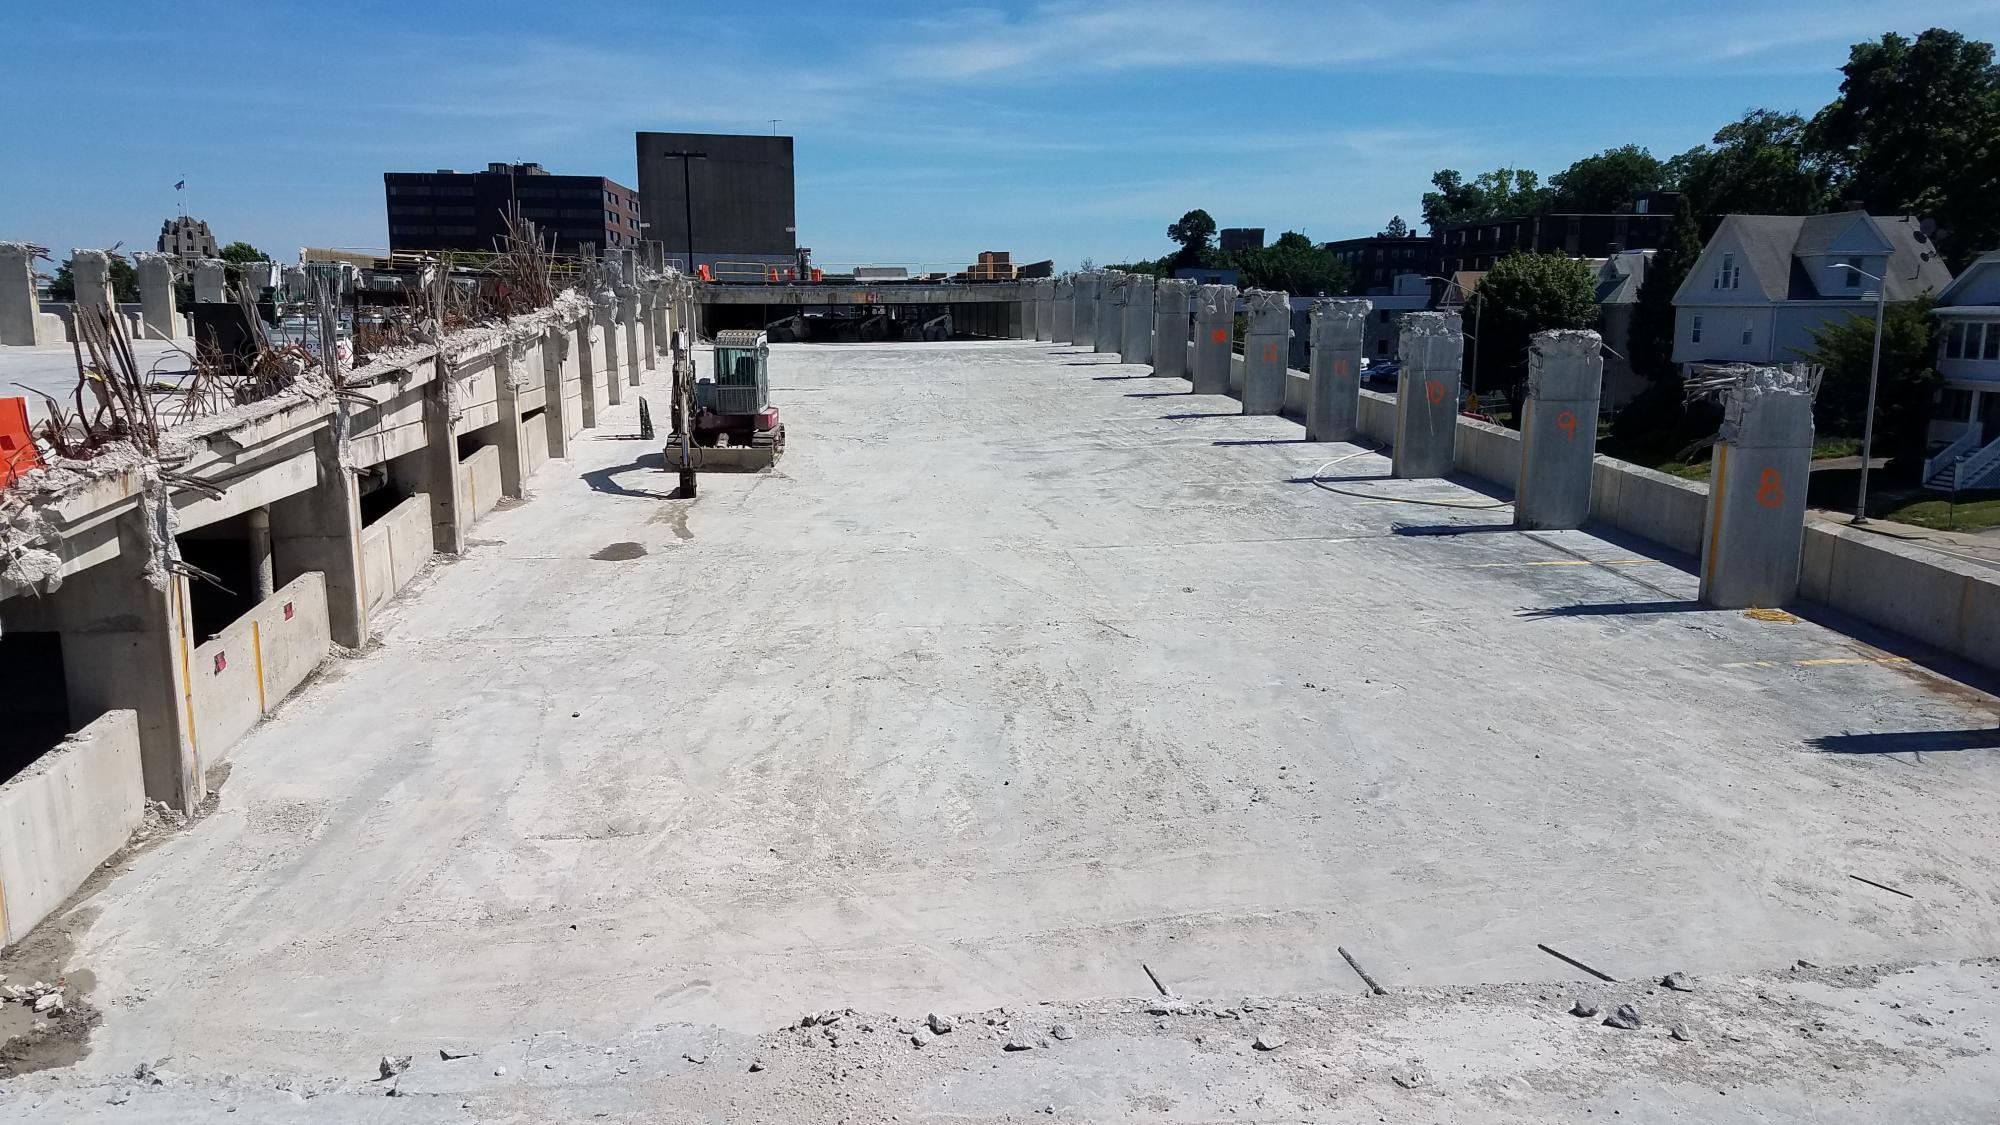 Demolition of Quincy Center garage (July 7, 2018)